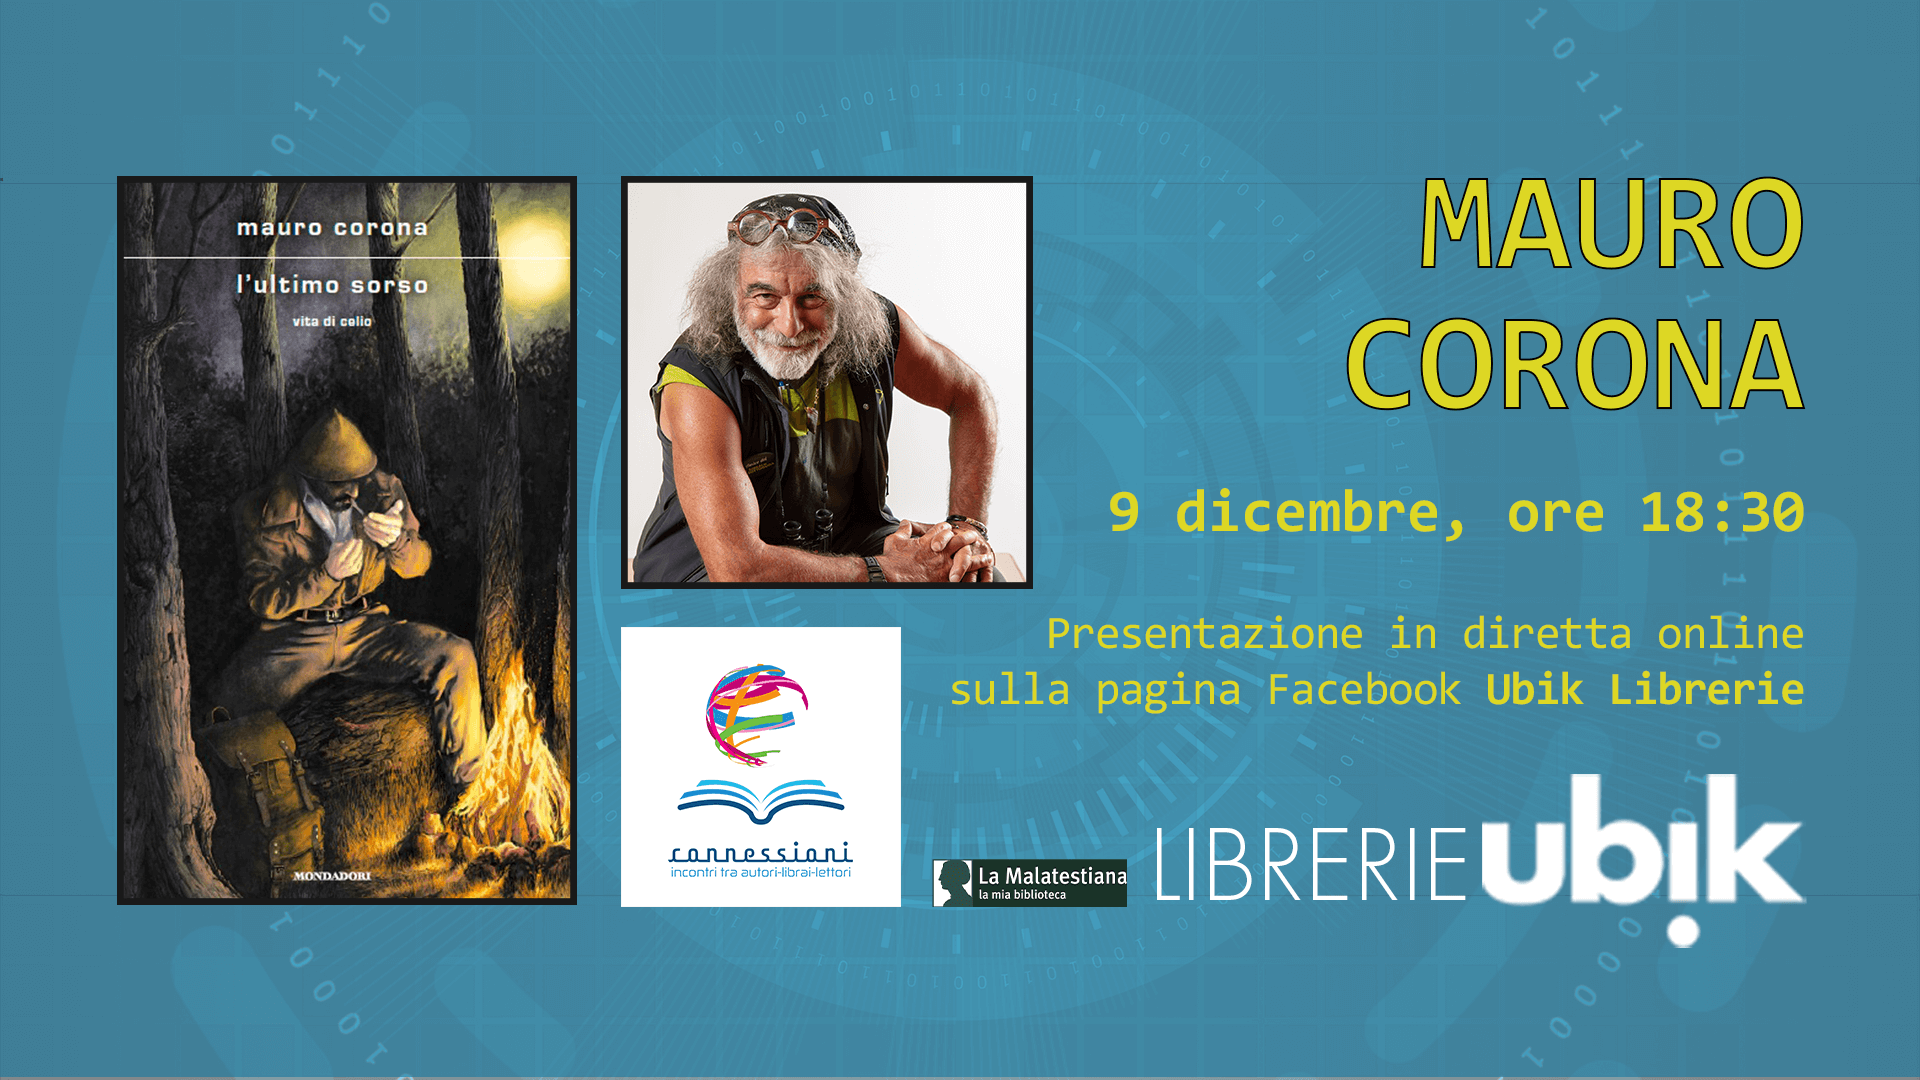 MAURO CORONA presenta in diretta online